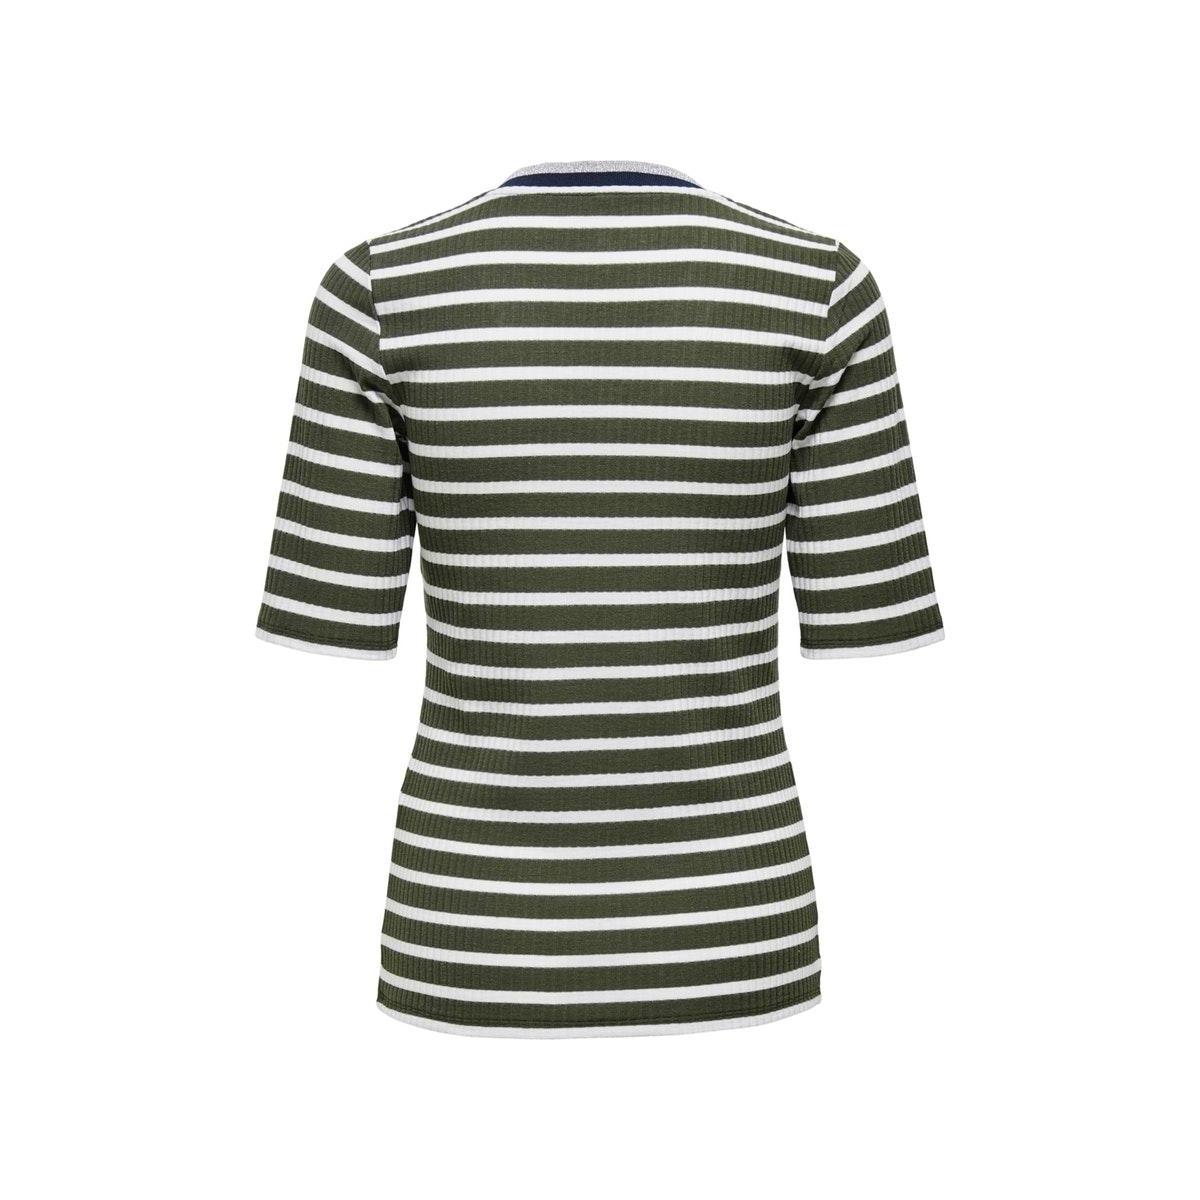 onlkilwa v-neck rib 2/4 top jrs 15219745 only t-shirt kalamata/cloud danc